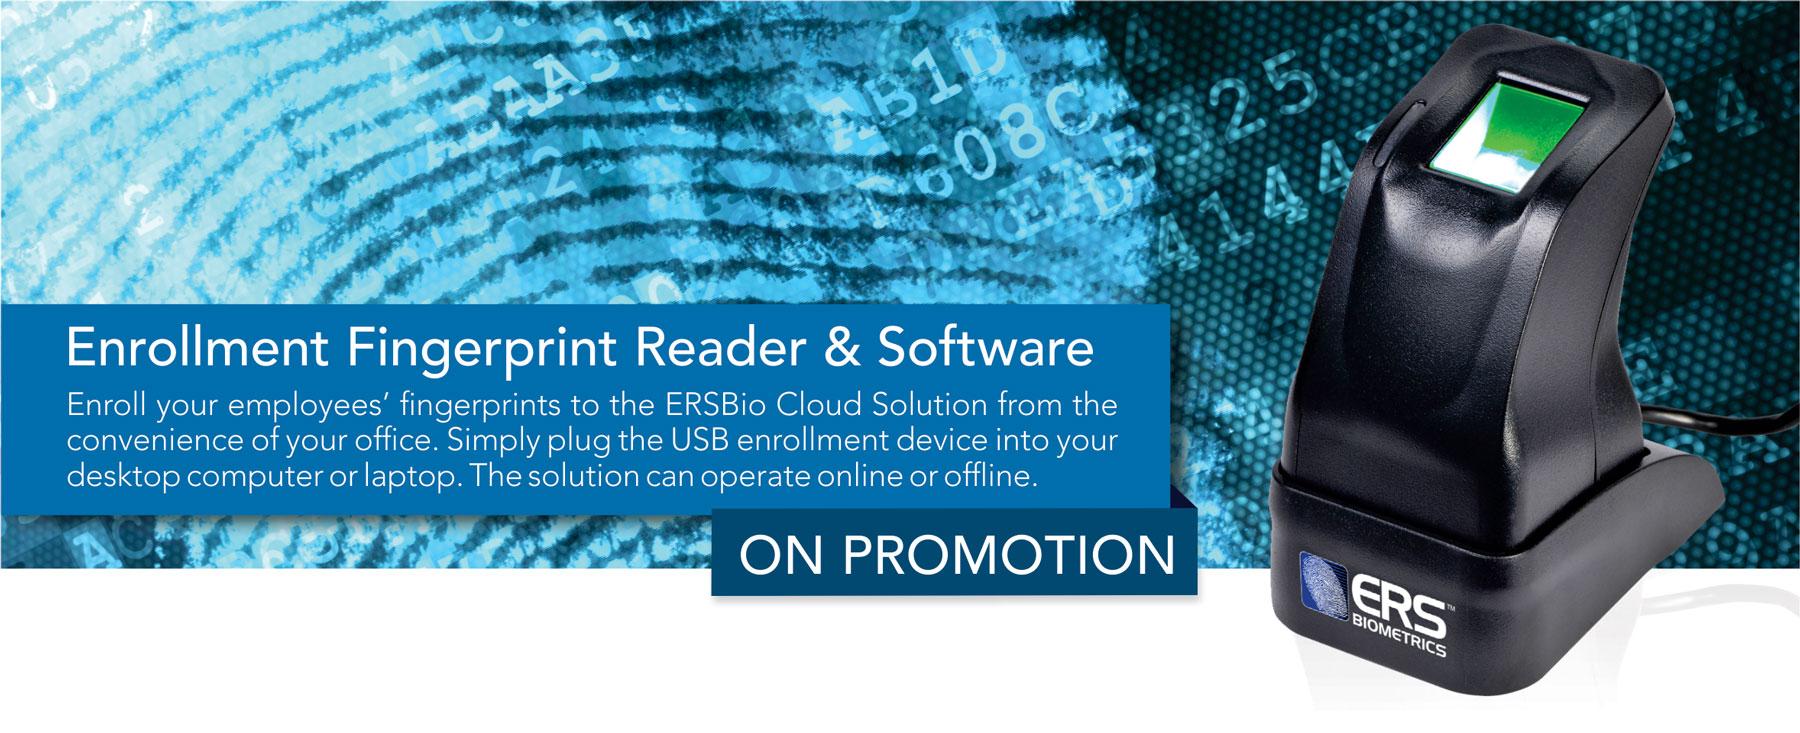 ERSBio Enrollment Reader Promo banner